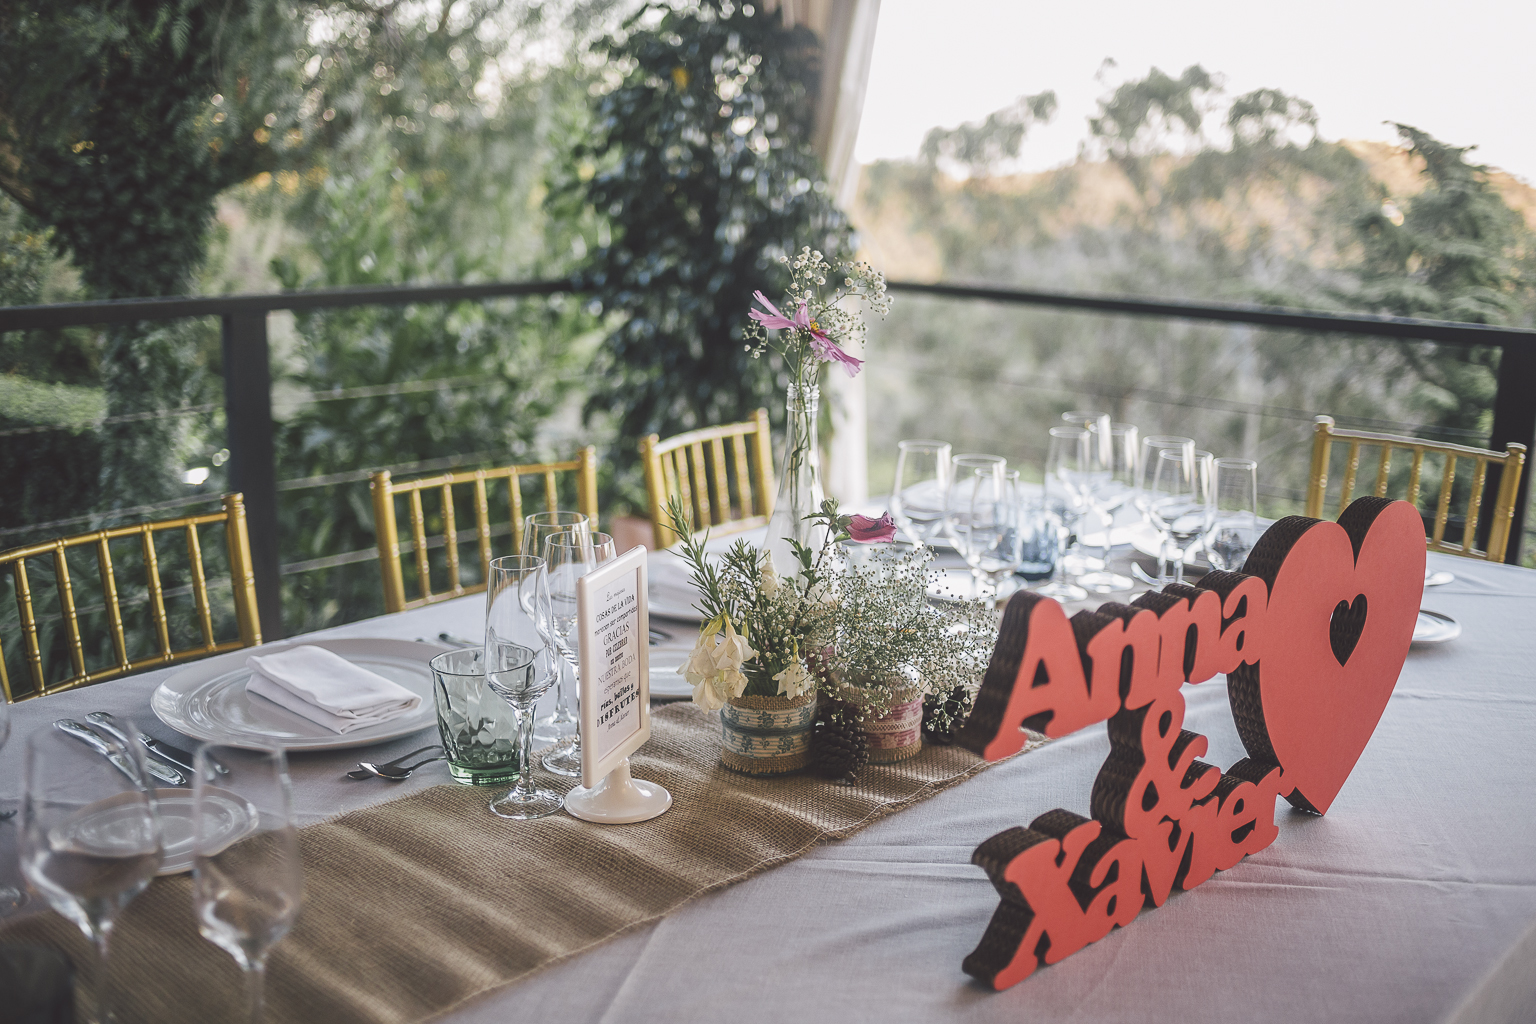 fotógrafo bodas barcelona :: fotografía de bodas barcelona :: vestido de novia corto :: Espacio Sol i Vida :: Boda Vintage